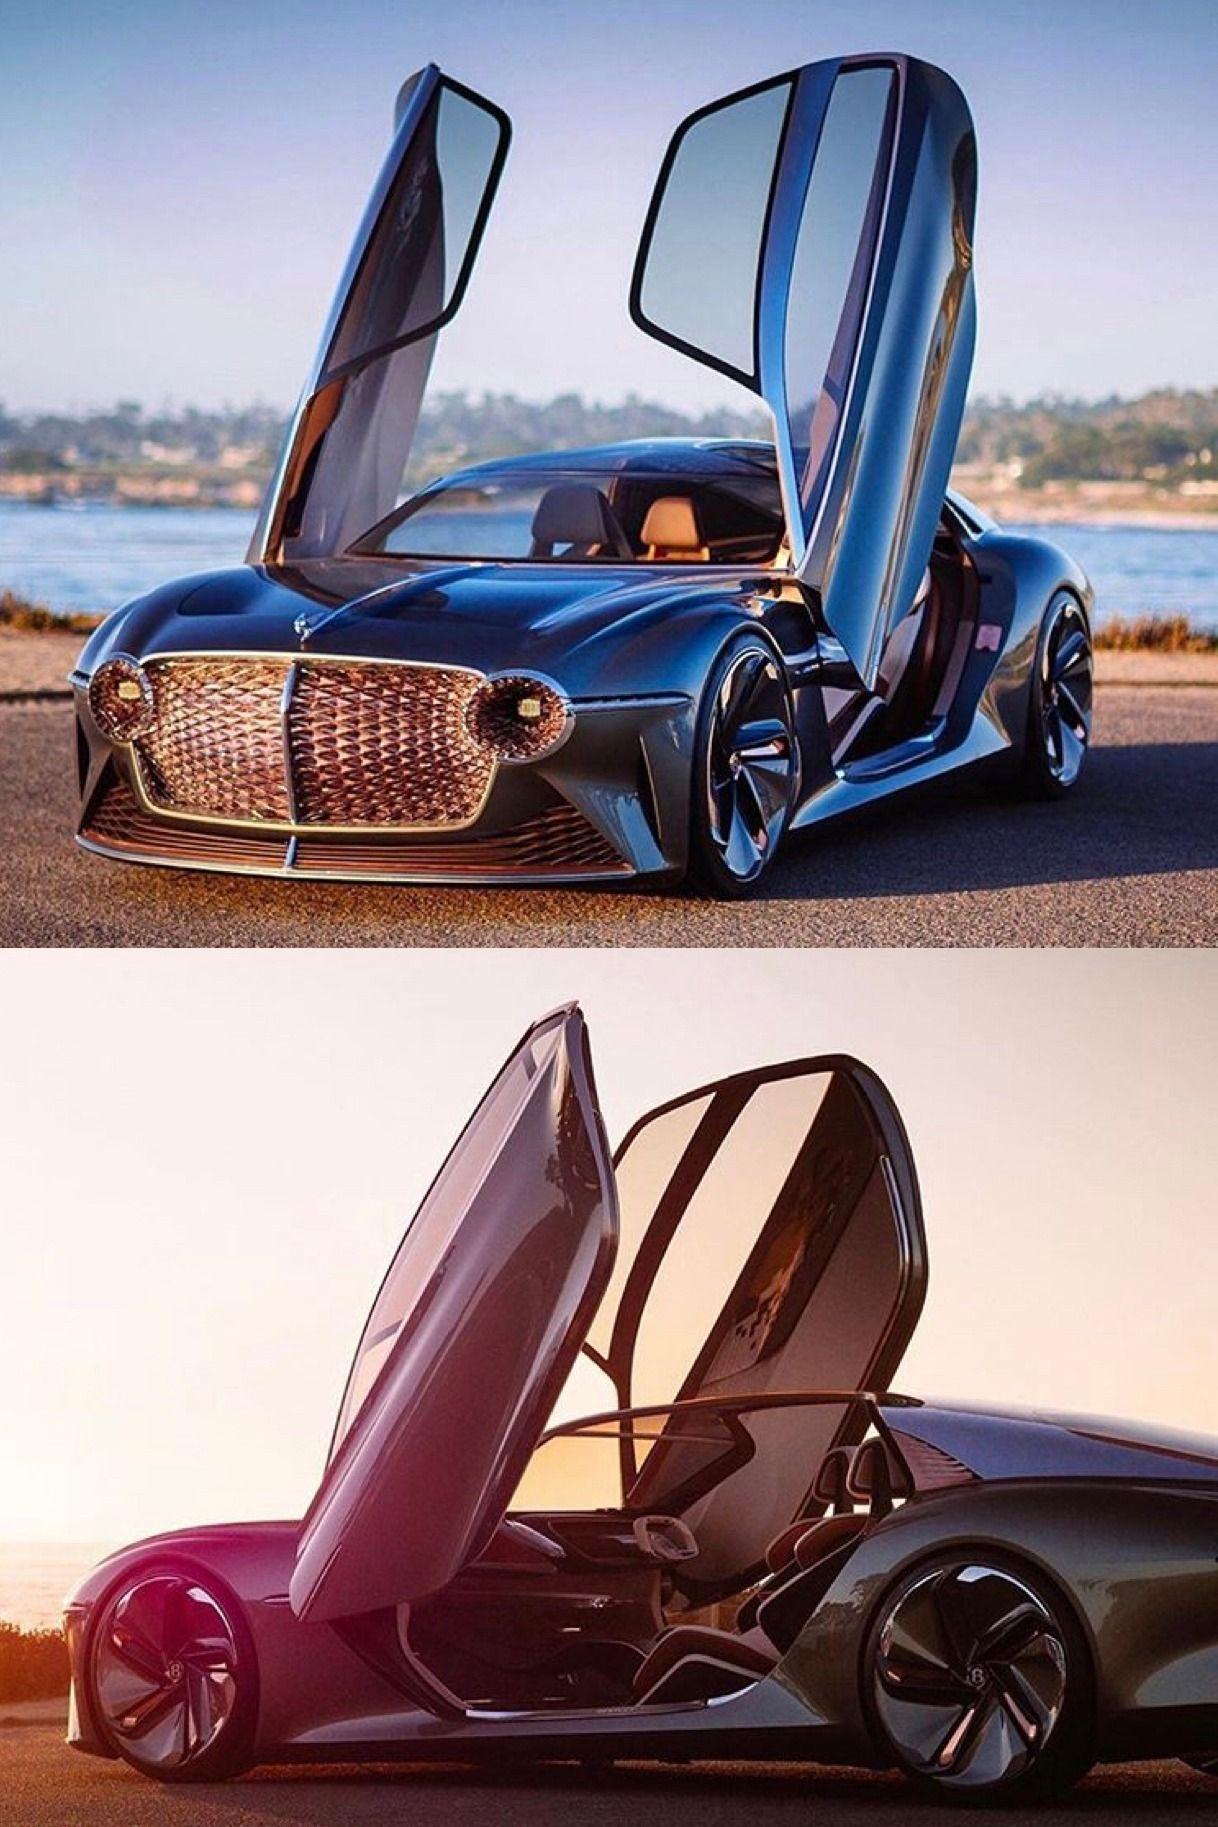 Supercars Cars Vehicles Auto Automotive Millionaires Billionaires Rich Luxury Lifestyle The Best Online Tools And In 2020 Super Cars Unique Cars Concept Cars